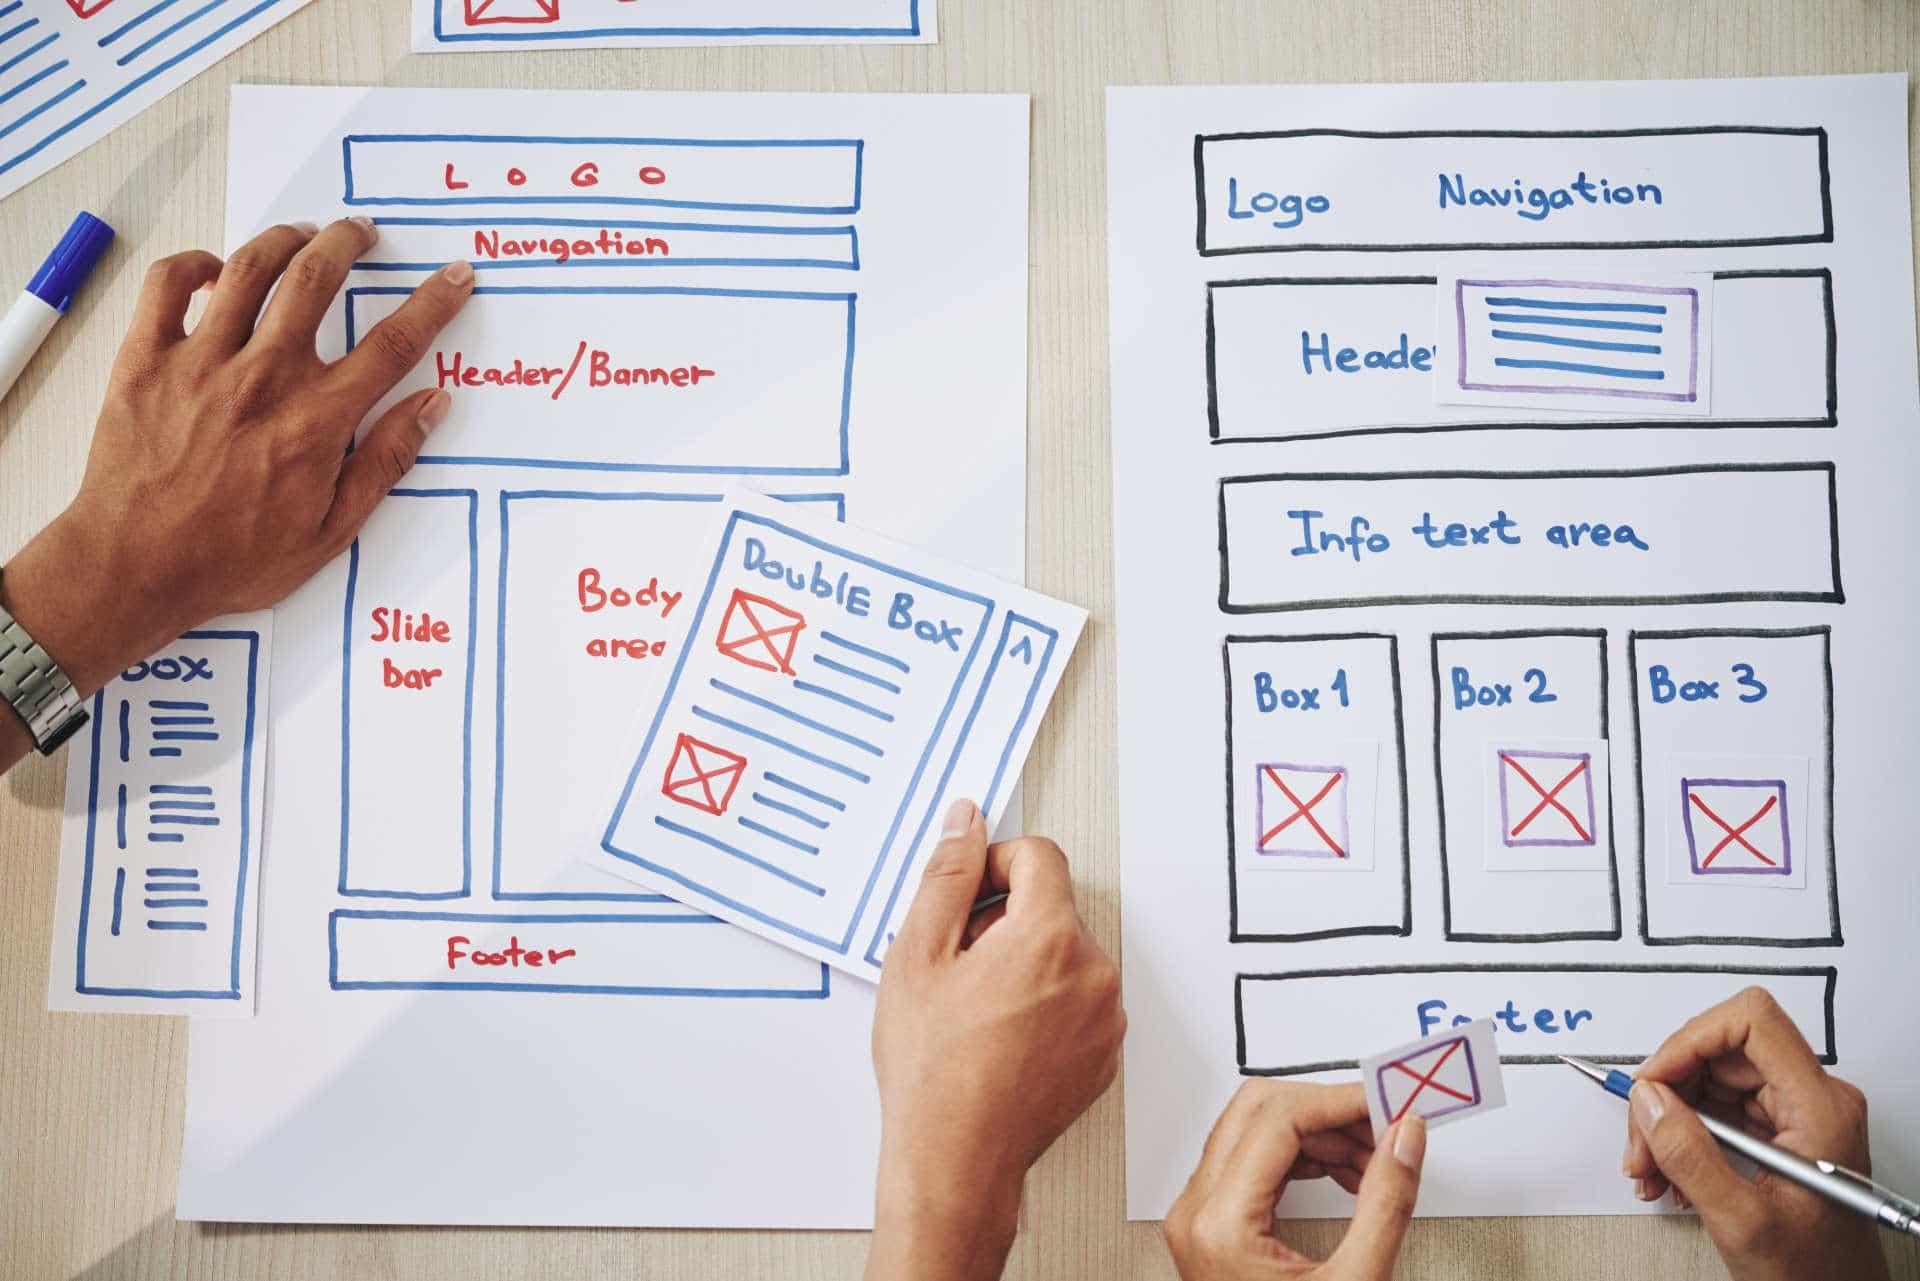 Website being designed on paper for Livingston business